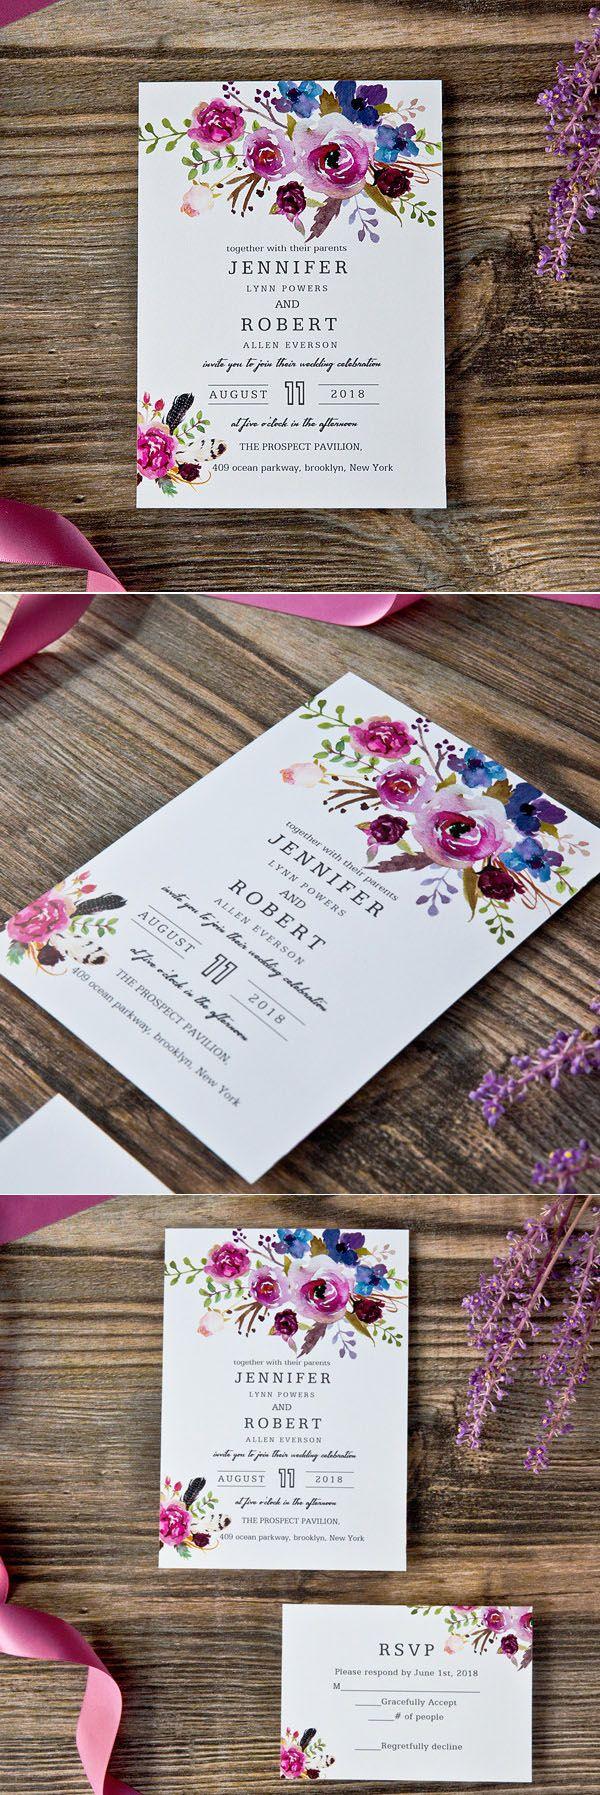 258 best Wedding Invitations images on Pinterest